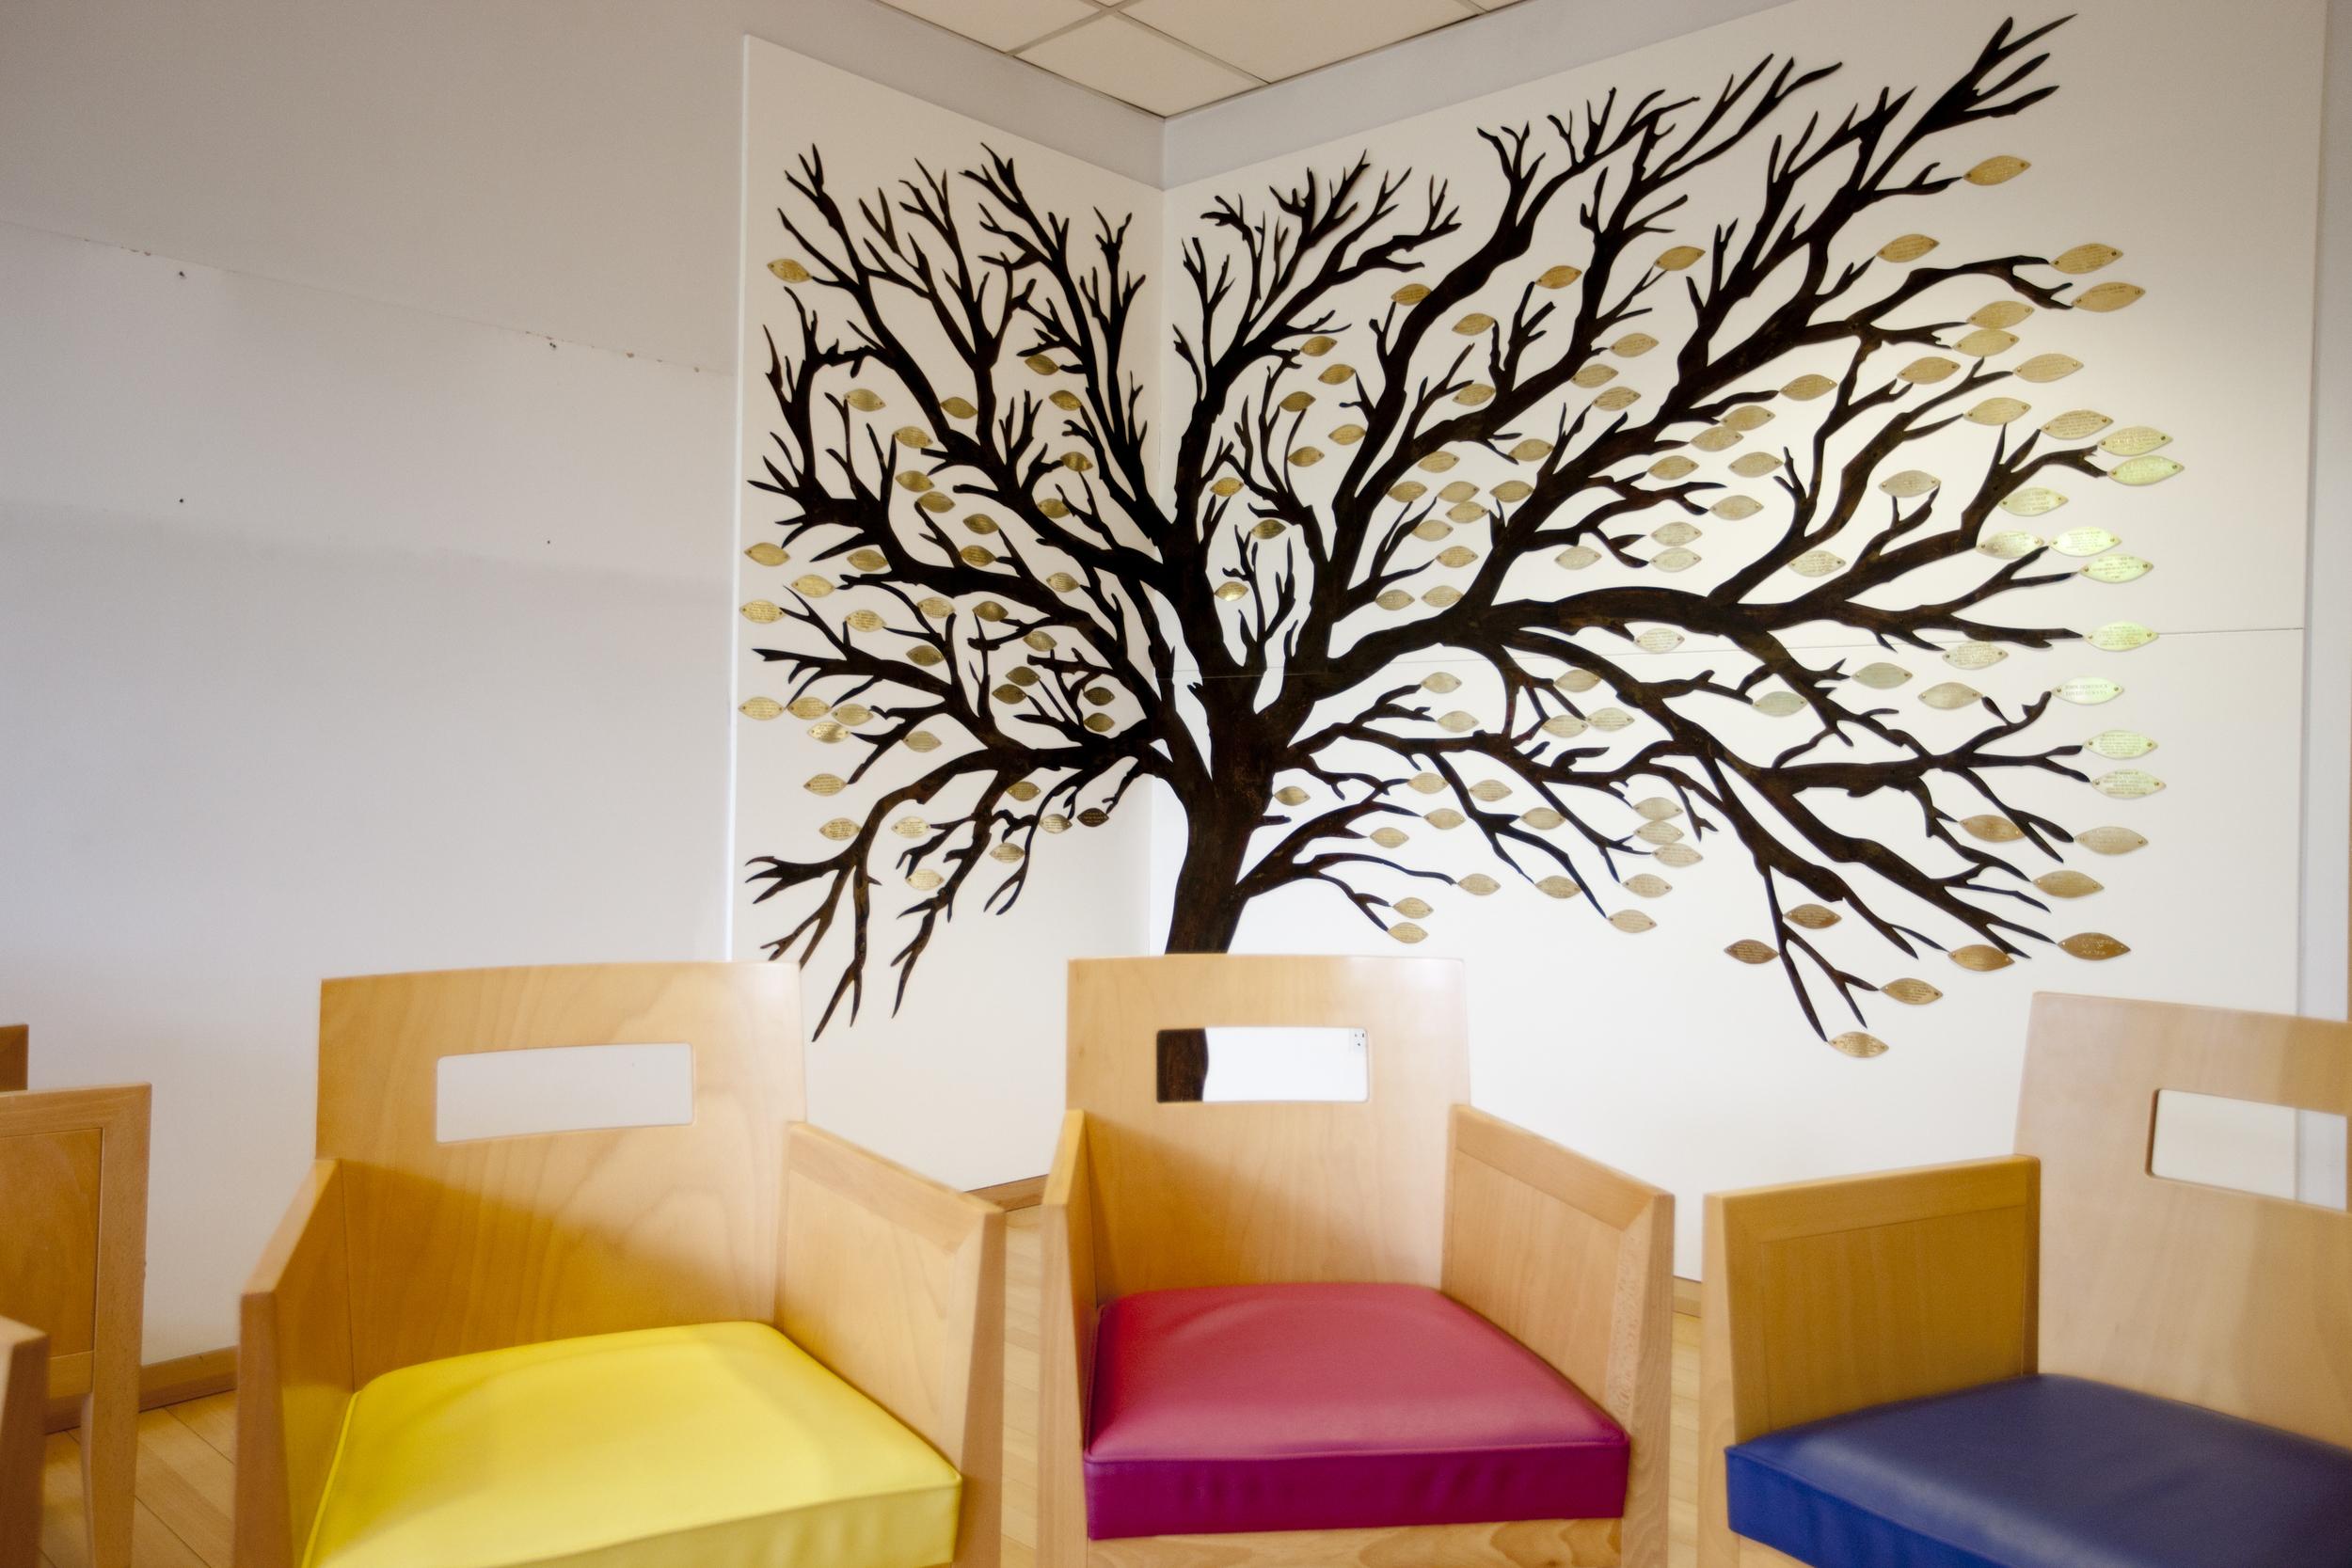 Image Memorial tree, St Christopher's Hospice, Nadia Bettega